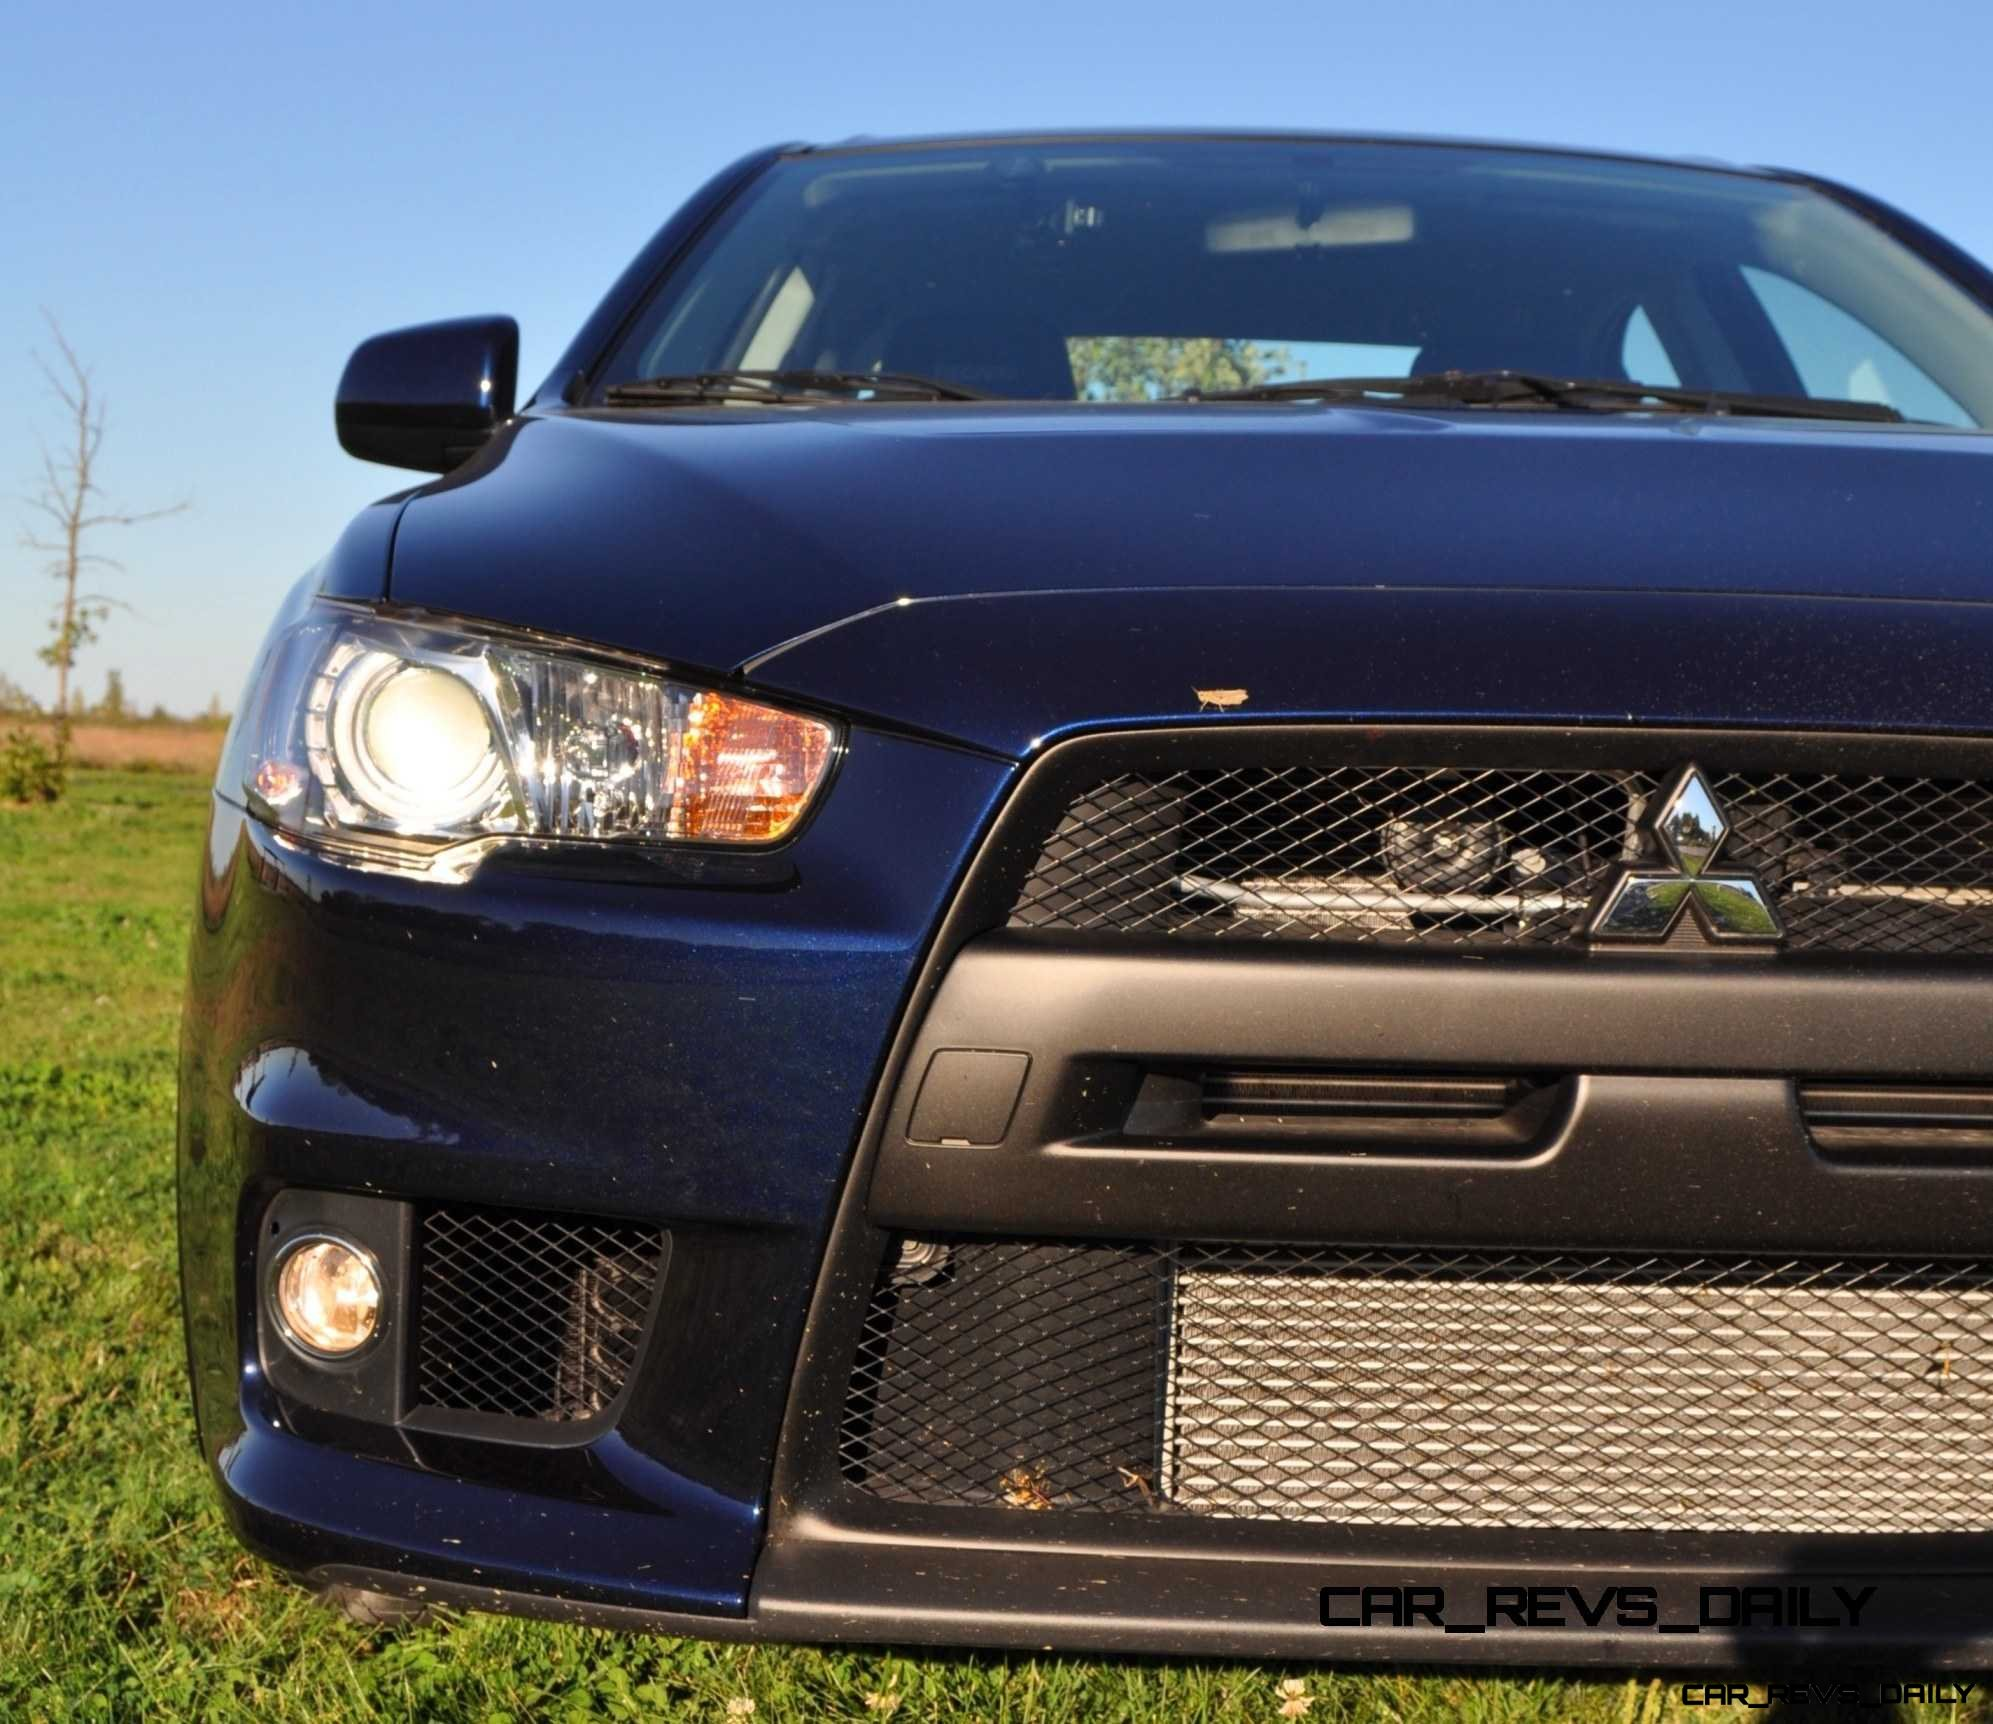 Mitsubishi Lancer Evo Wallpaper Hd: 2014 Mitsubishi Lancer Evolution GSR